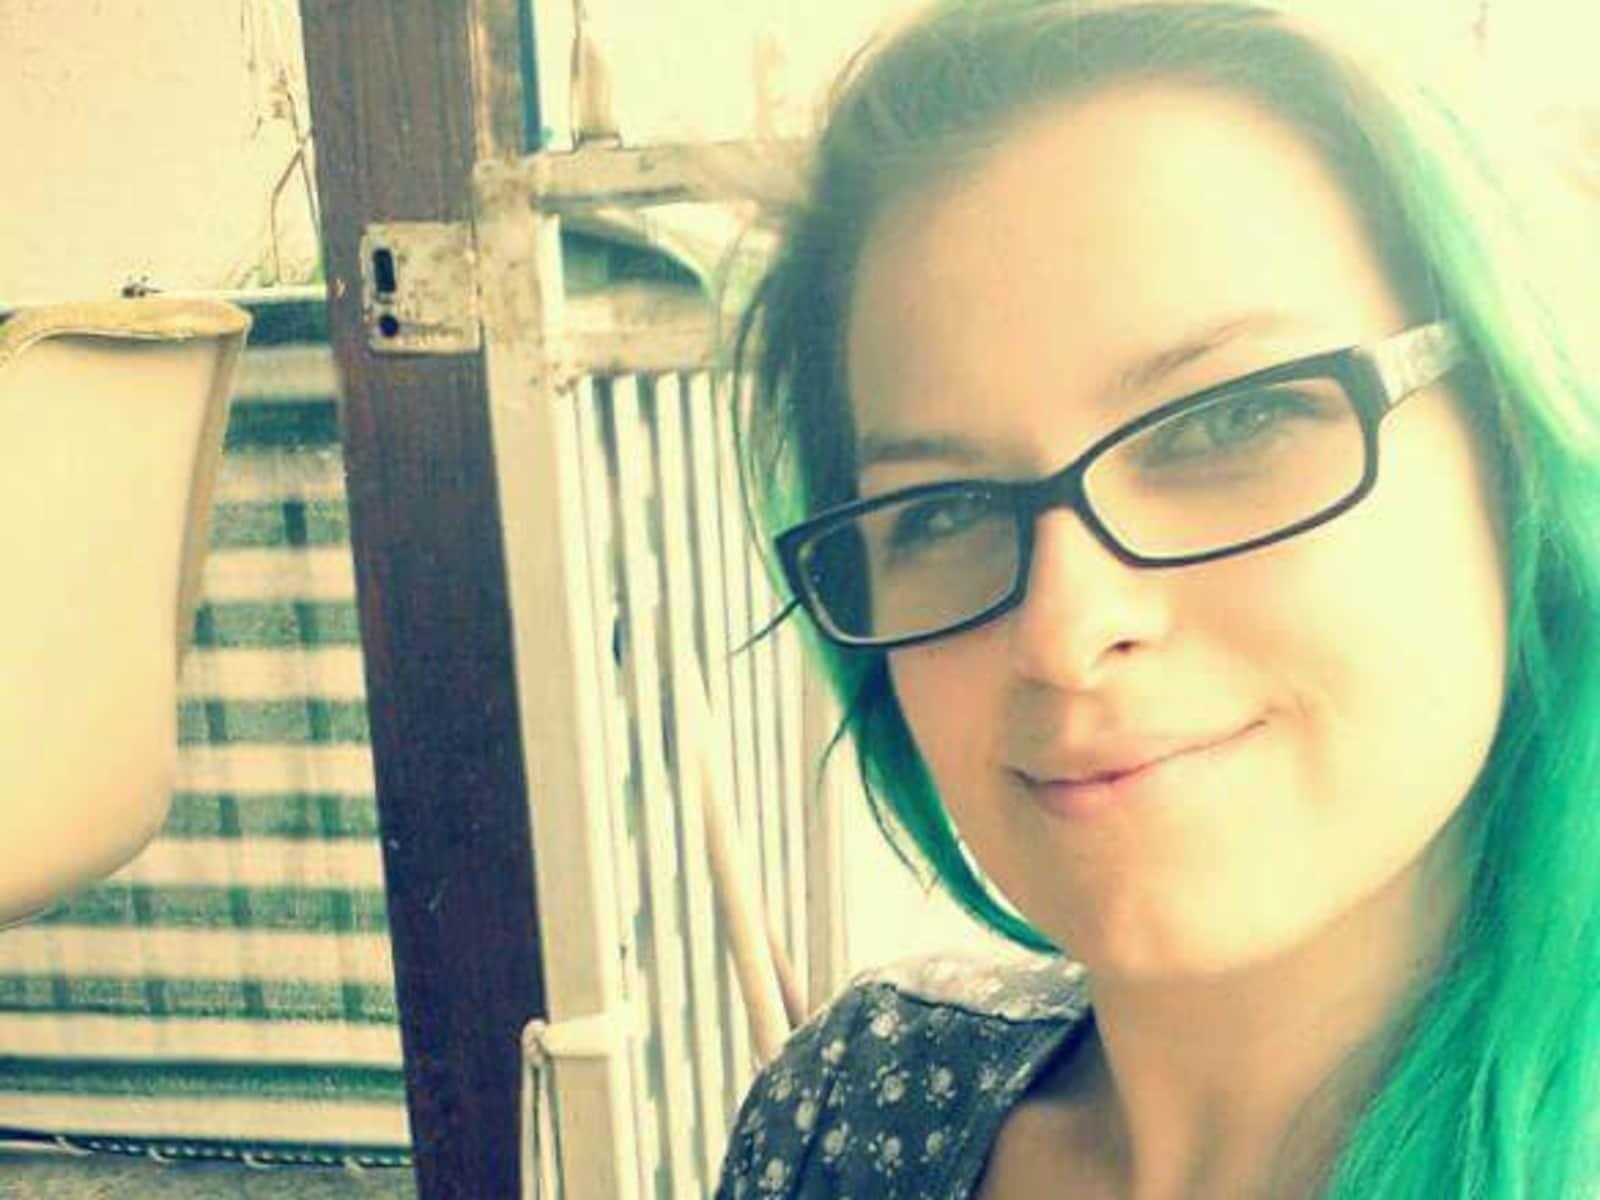 Andreja from Melbourne, Victoria, Australia